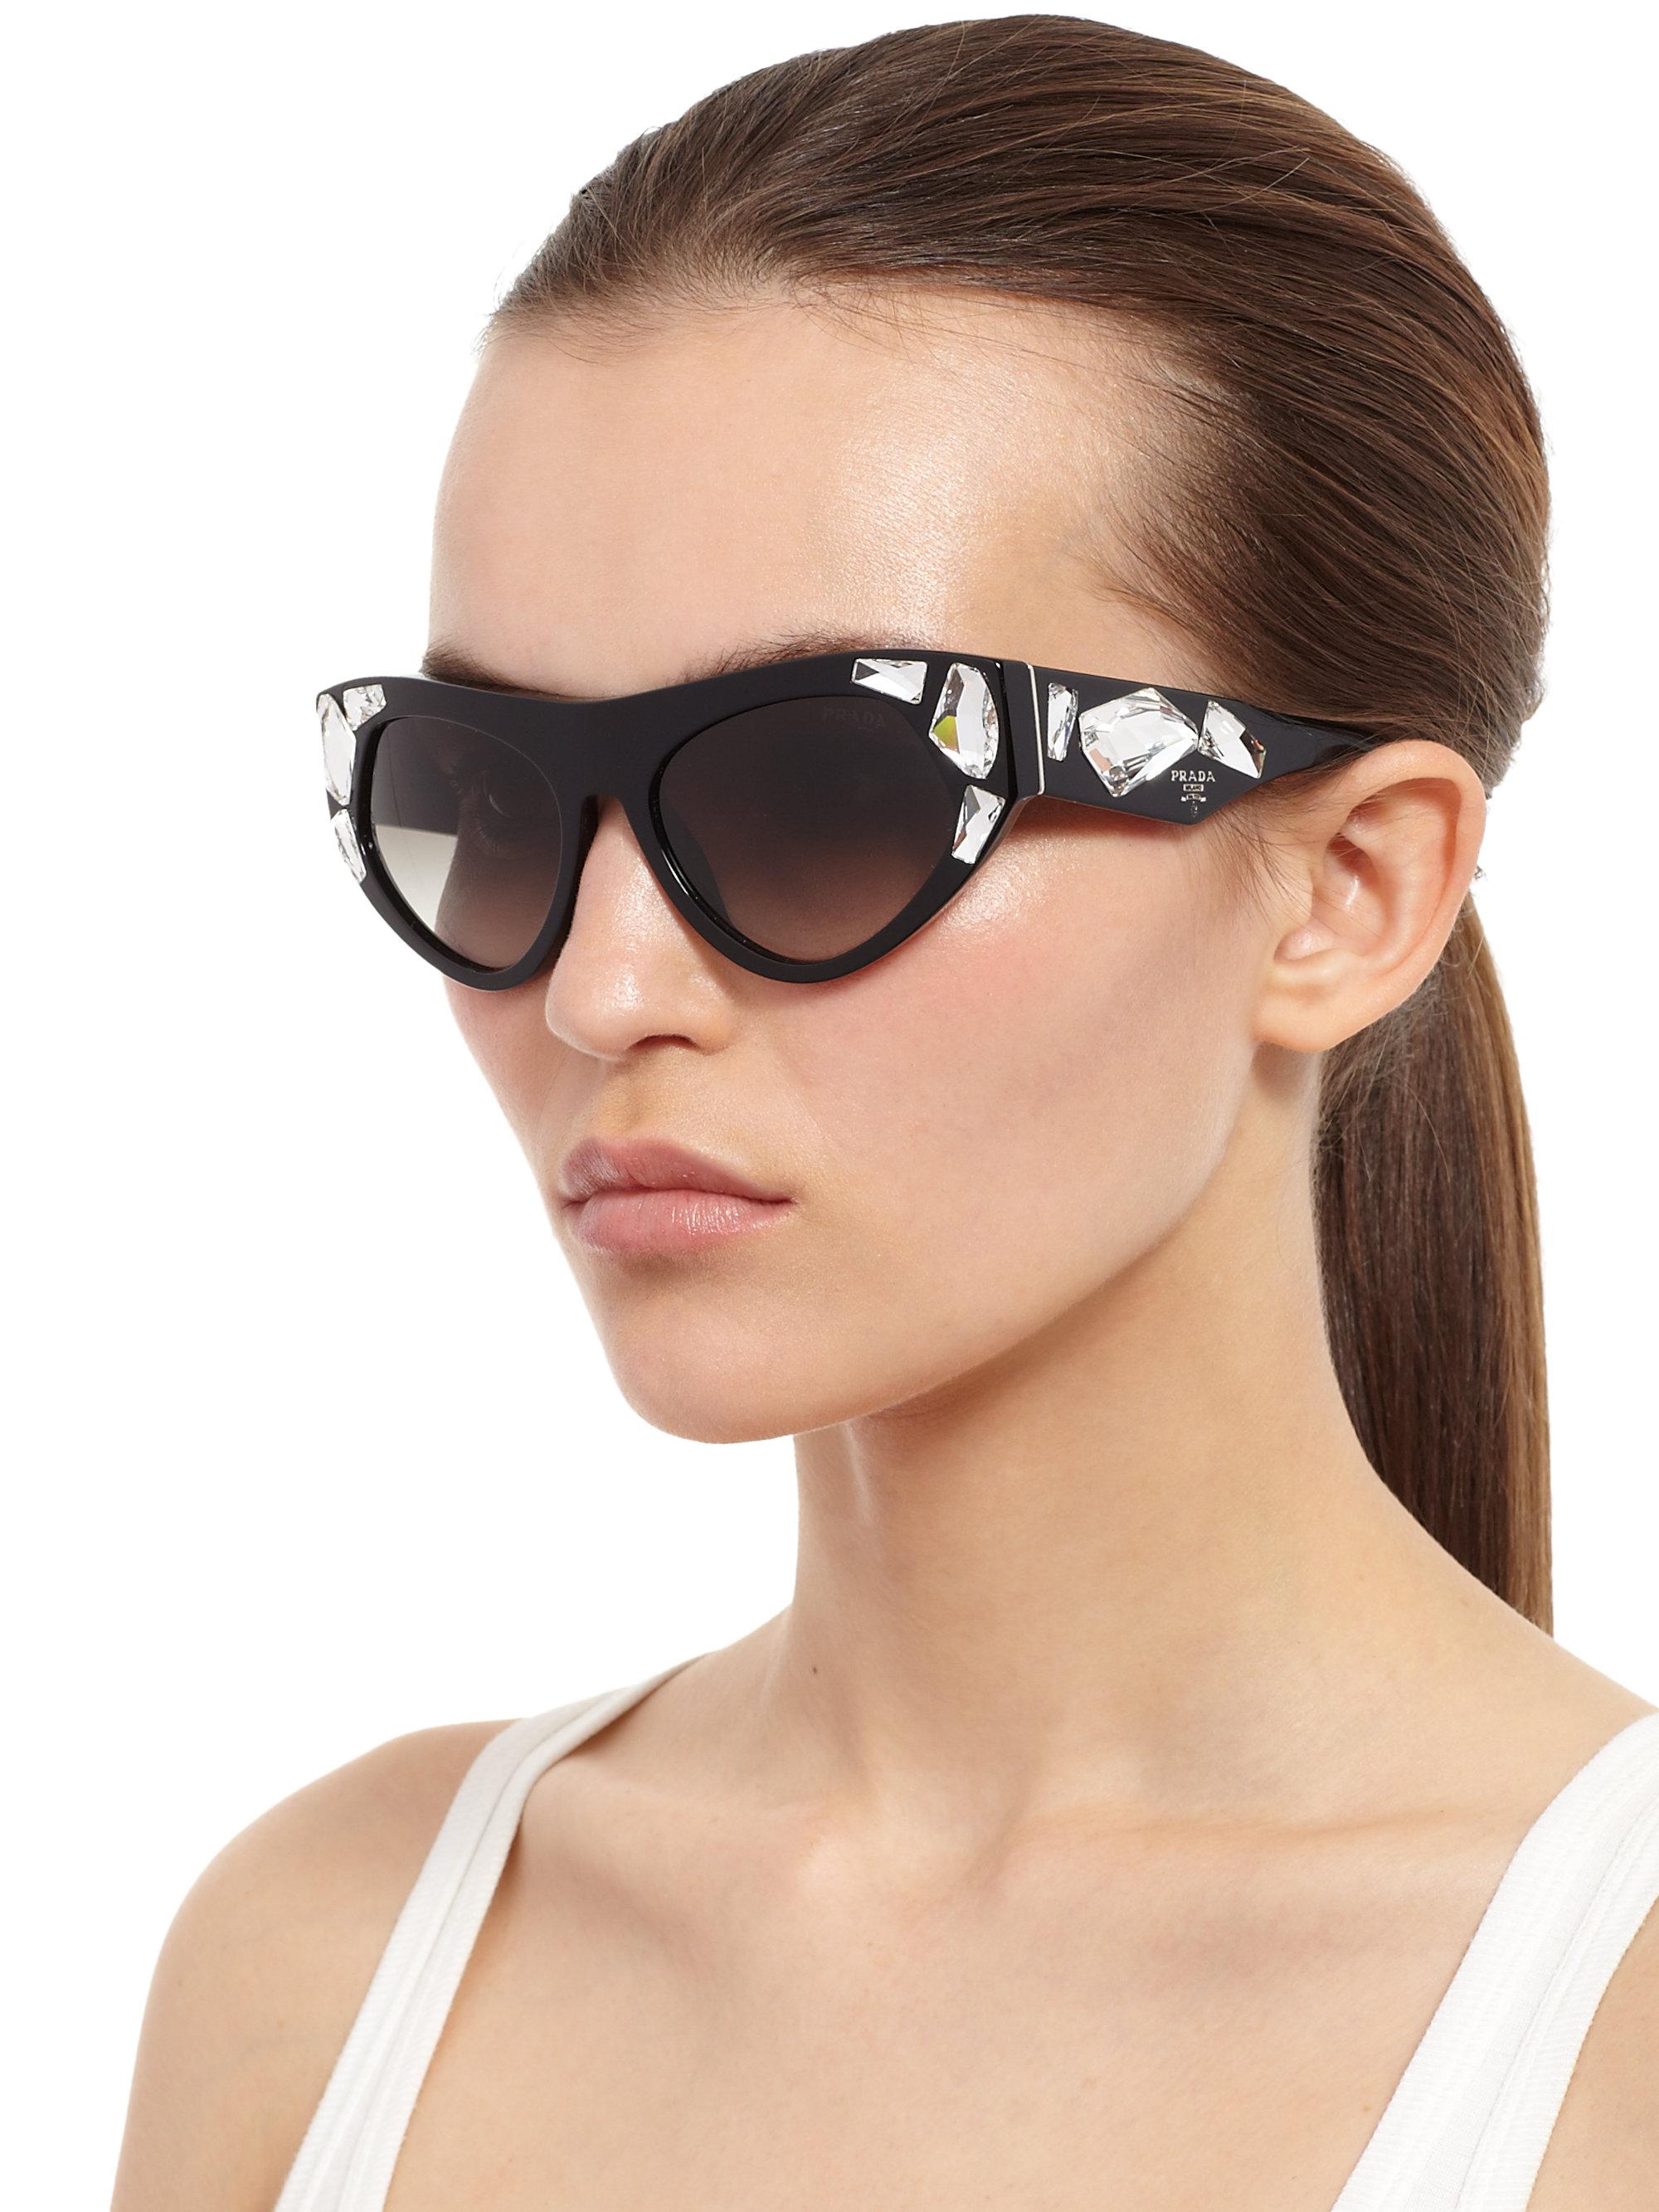 434e700f1d2 ... where to buy lyst prada oversized embellished sunglasses in black 215f6  e81ff cheap prada eyewear cat eye ...